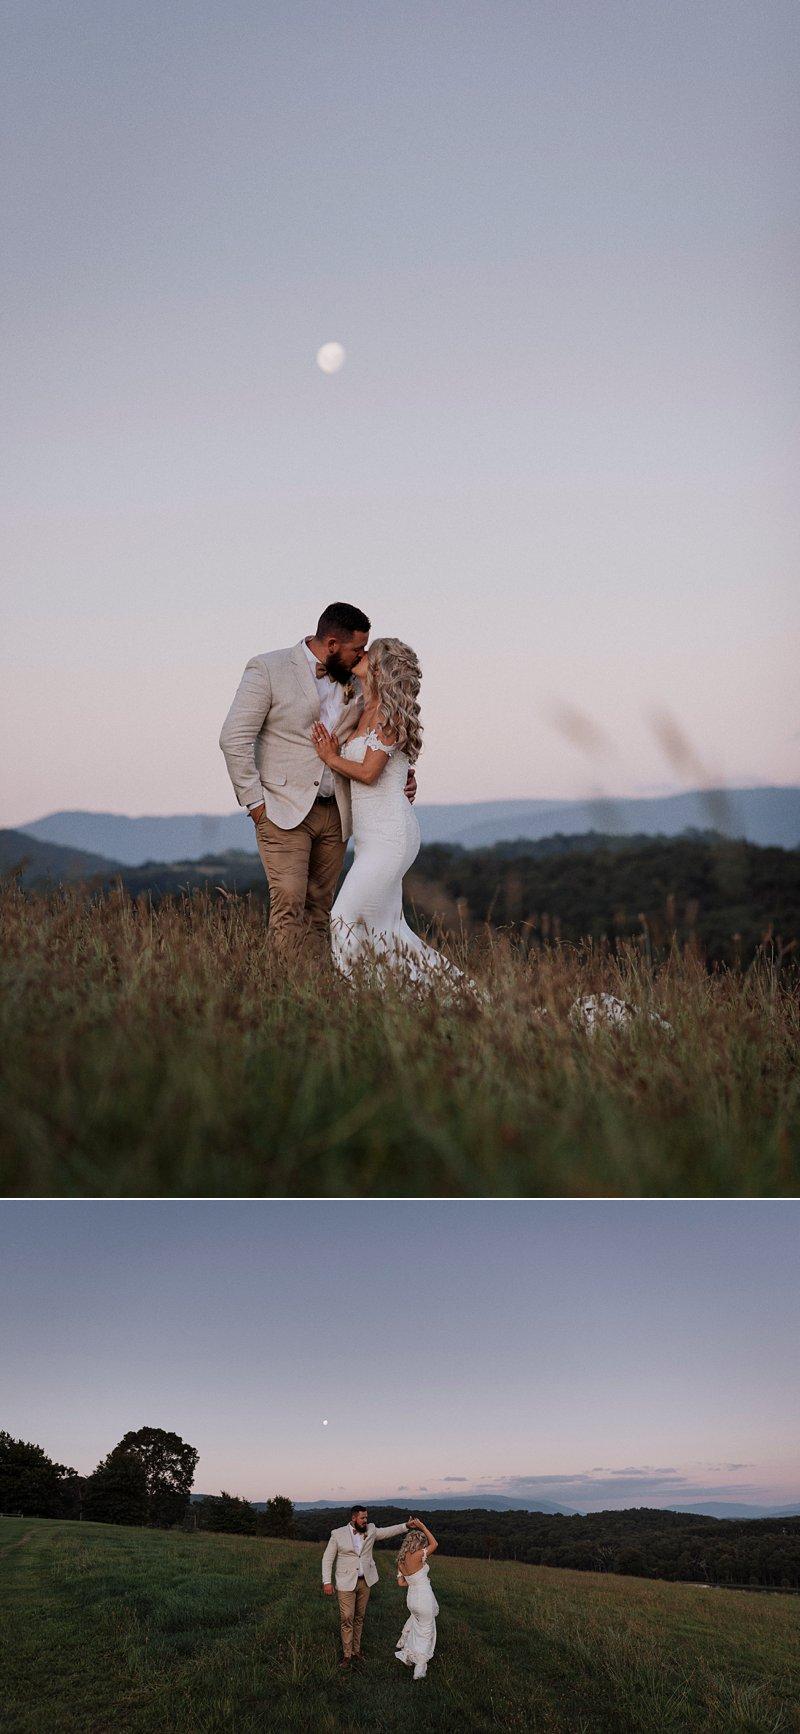 Wandin Park Estate wedding, Farm Wedding, Sunset Photos